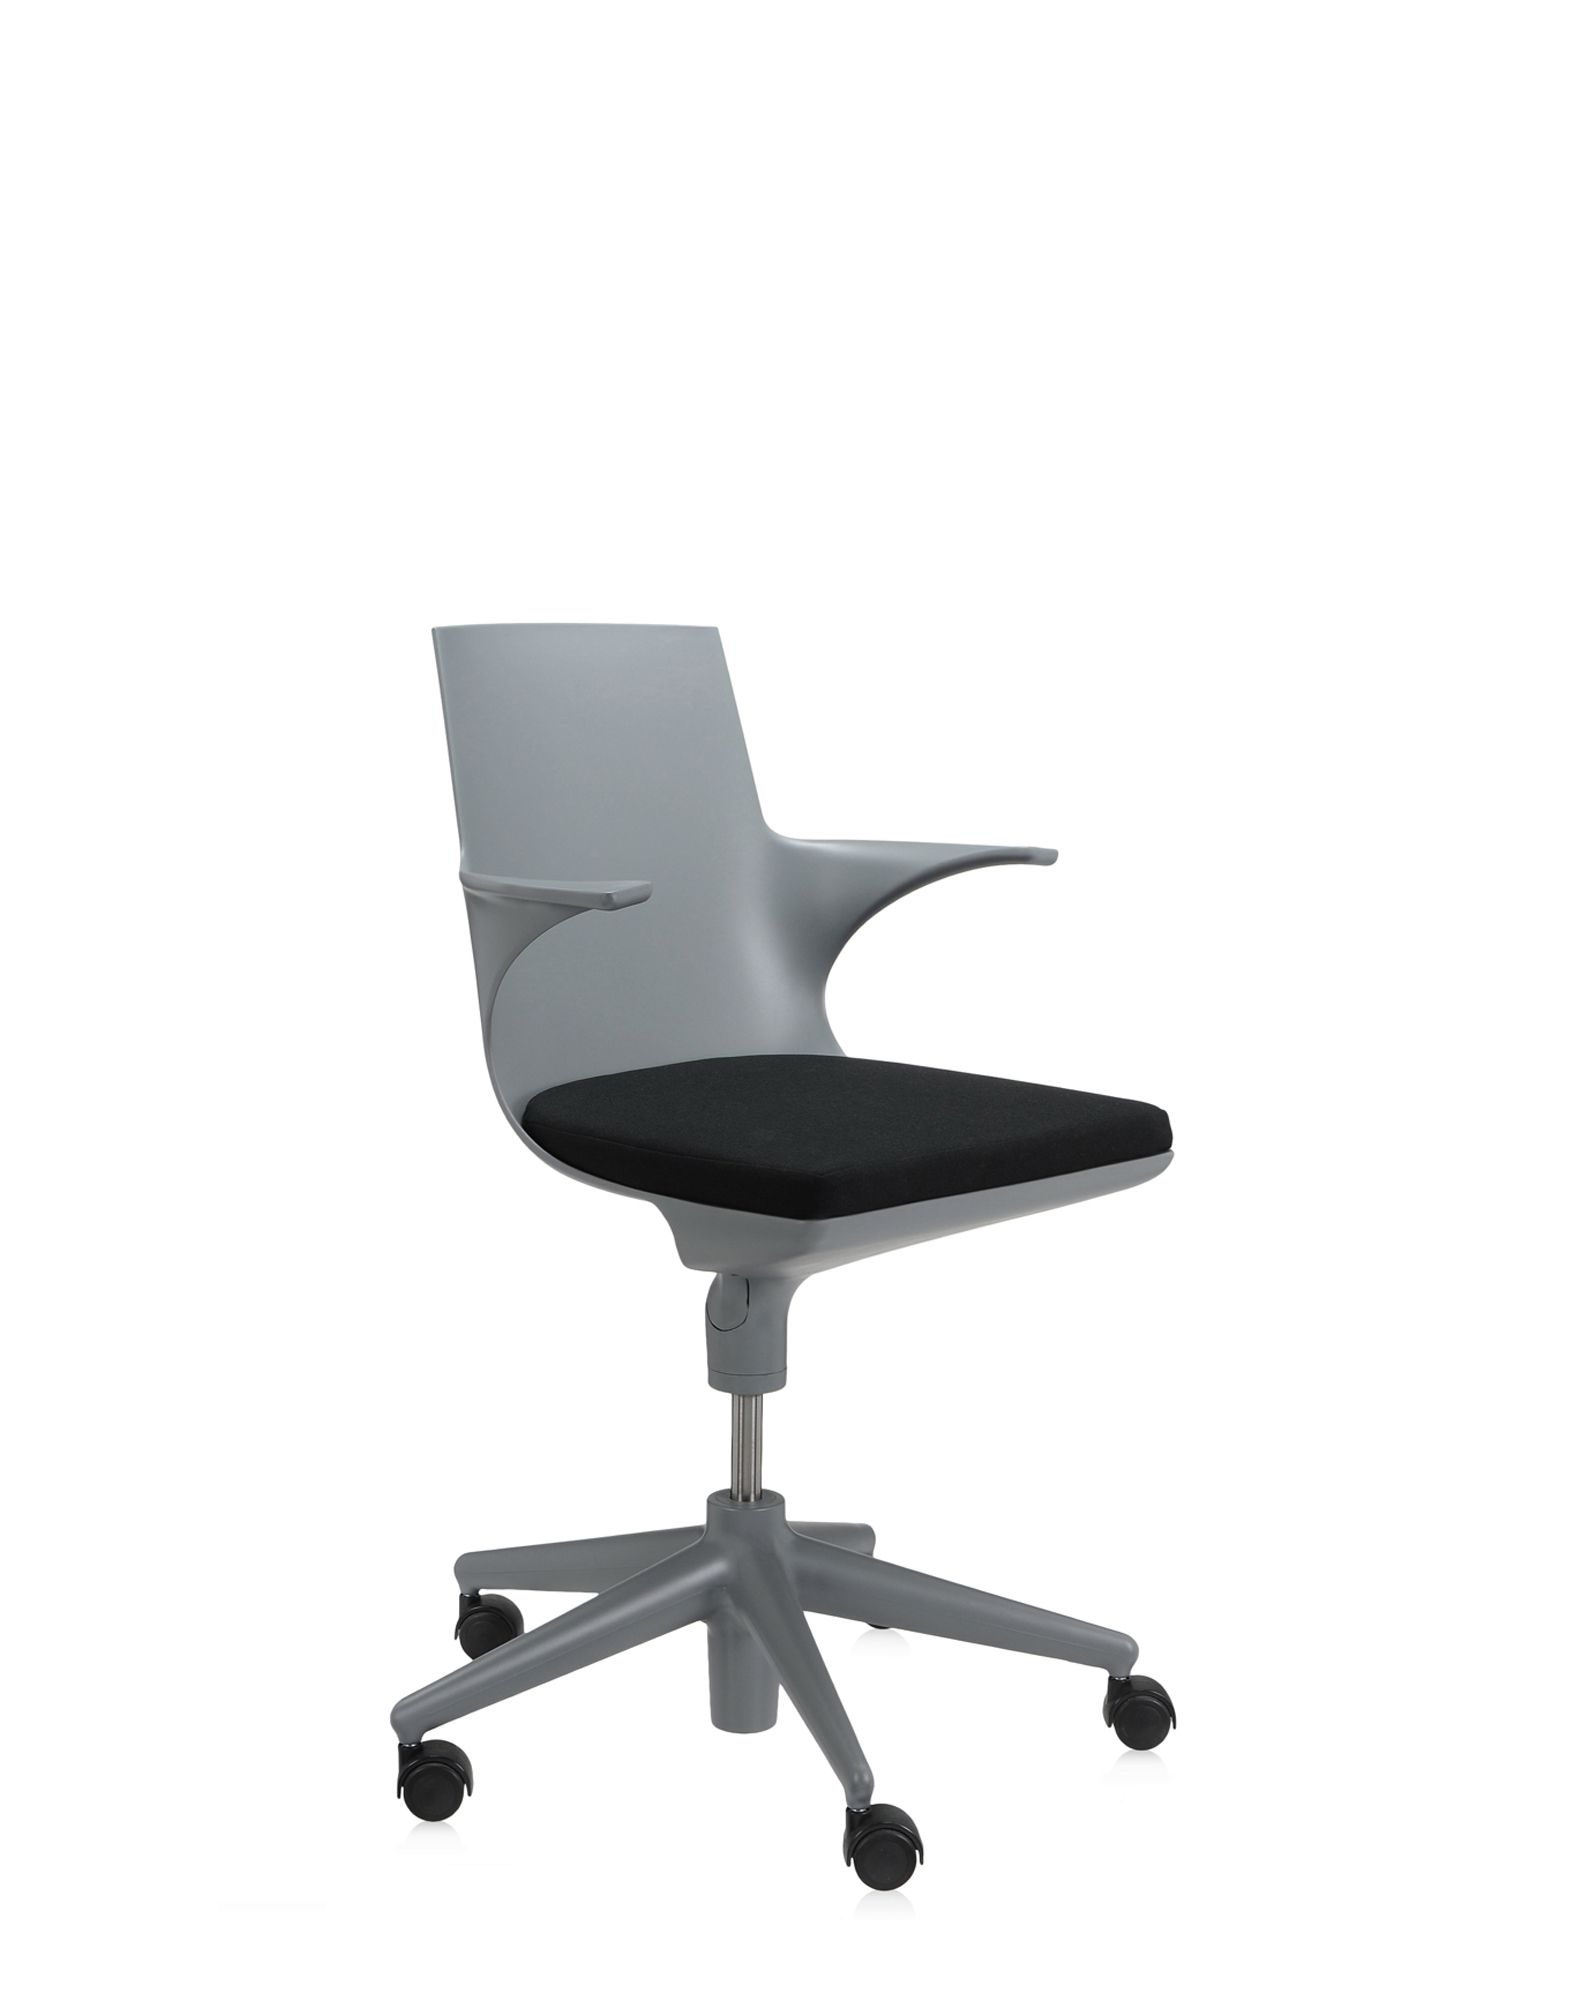 Kartell Office Chair Spoon Grey Black